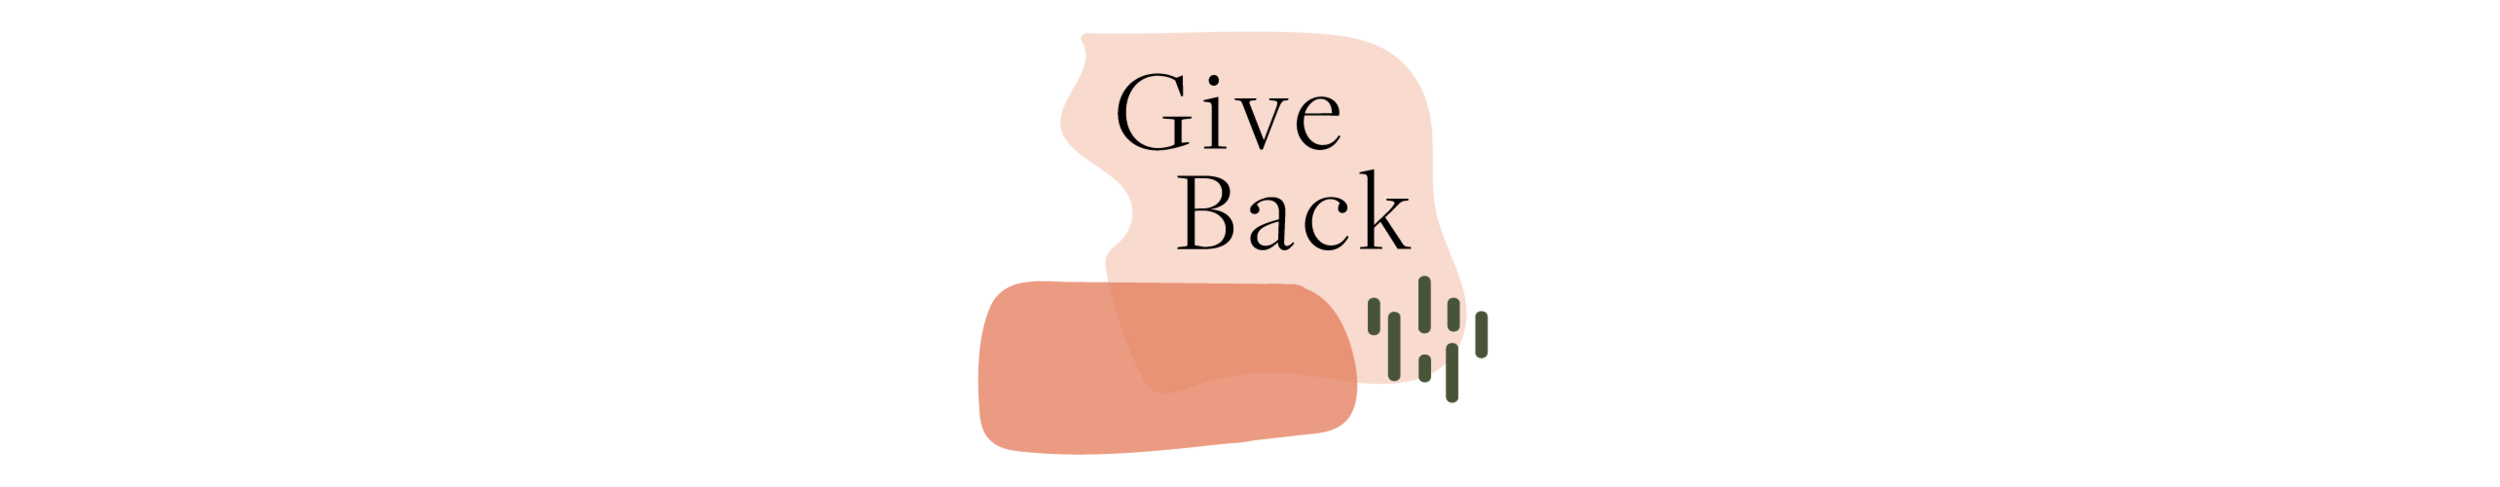 giveback-04.png